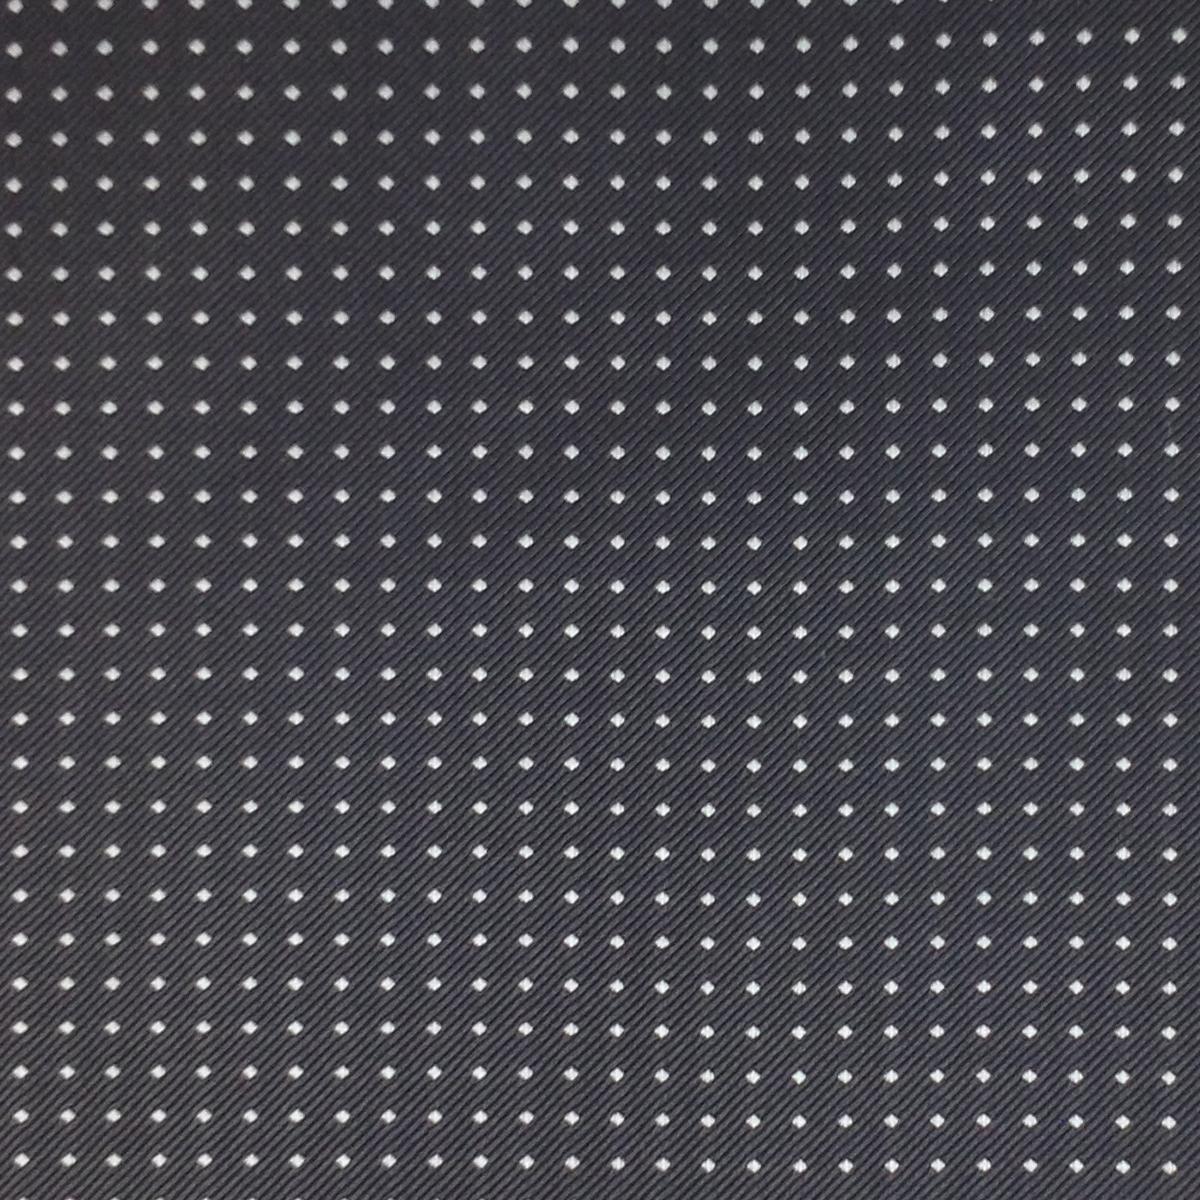 N657 spots CCOAL white - - Con Murphys Menswear